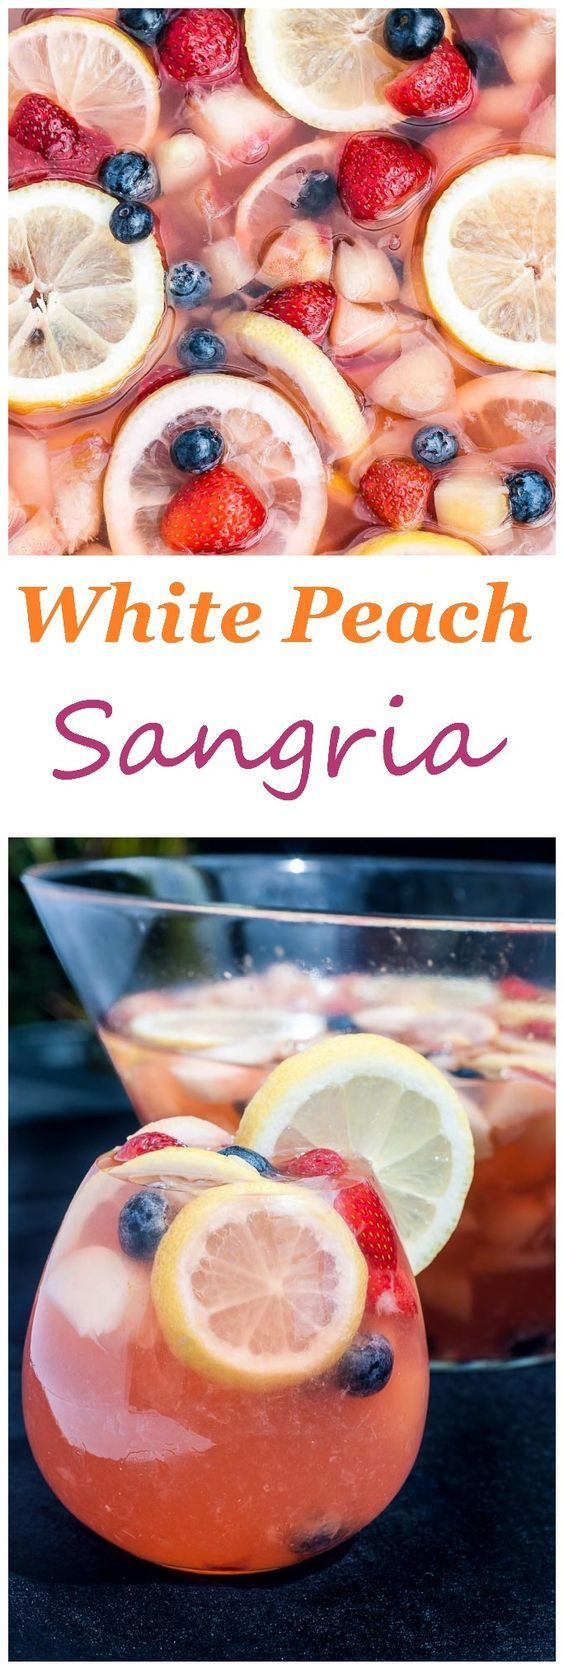 White Peach Sangria Recipe with White Wine, Blueberries, Strawberries and Lemon | VeganFamilyRecipes.com #contest